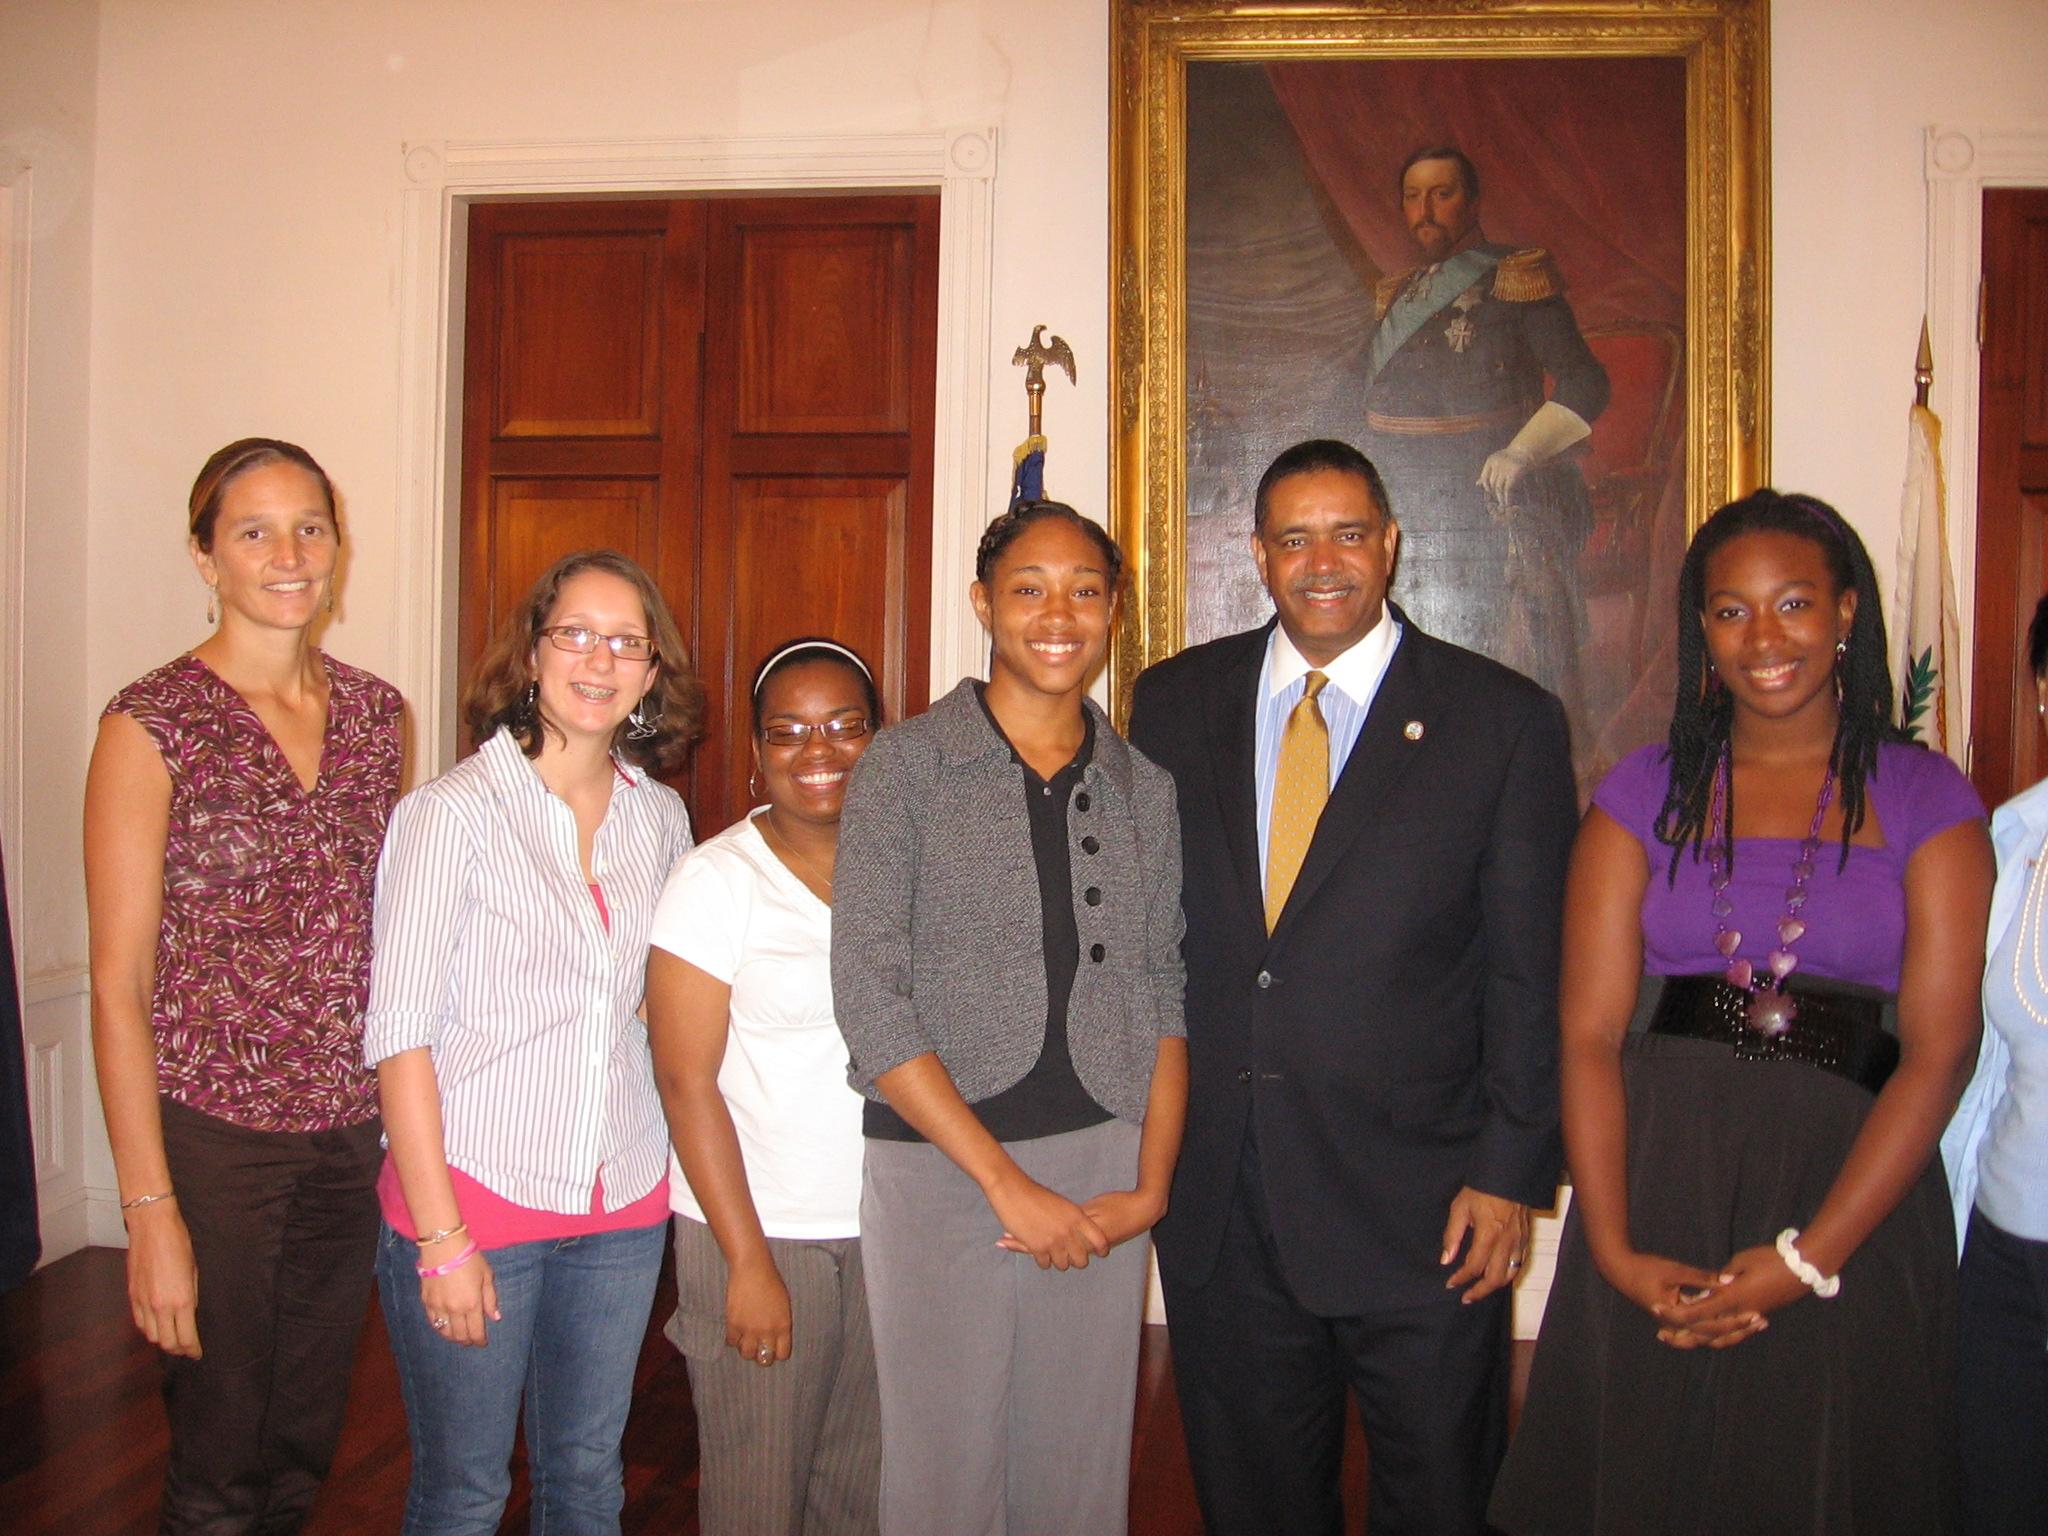 Pictured left to right – Acting Head of Upper School Leslie Hamdorf, Eliza Mongeau, Nyasia Santiago, Ashlee Douglas, Gov. deJongh and Shani Cox